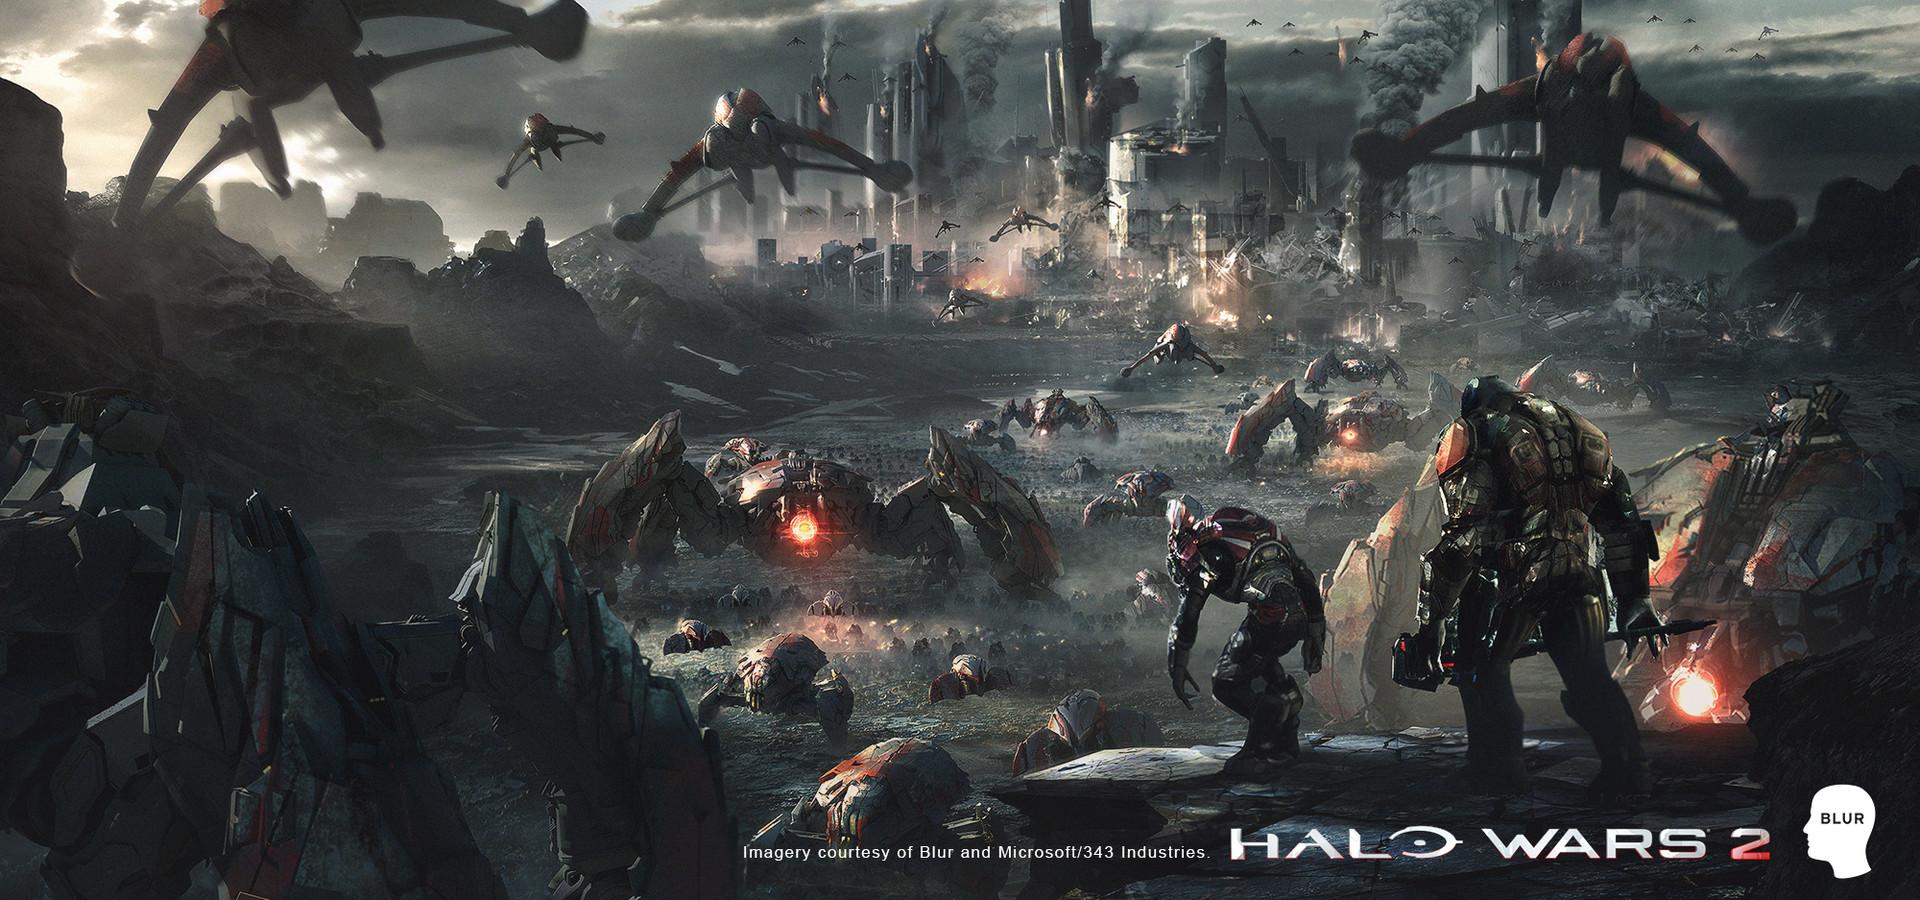 New Halo Wars 2 art piece -